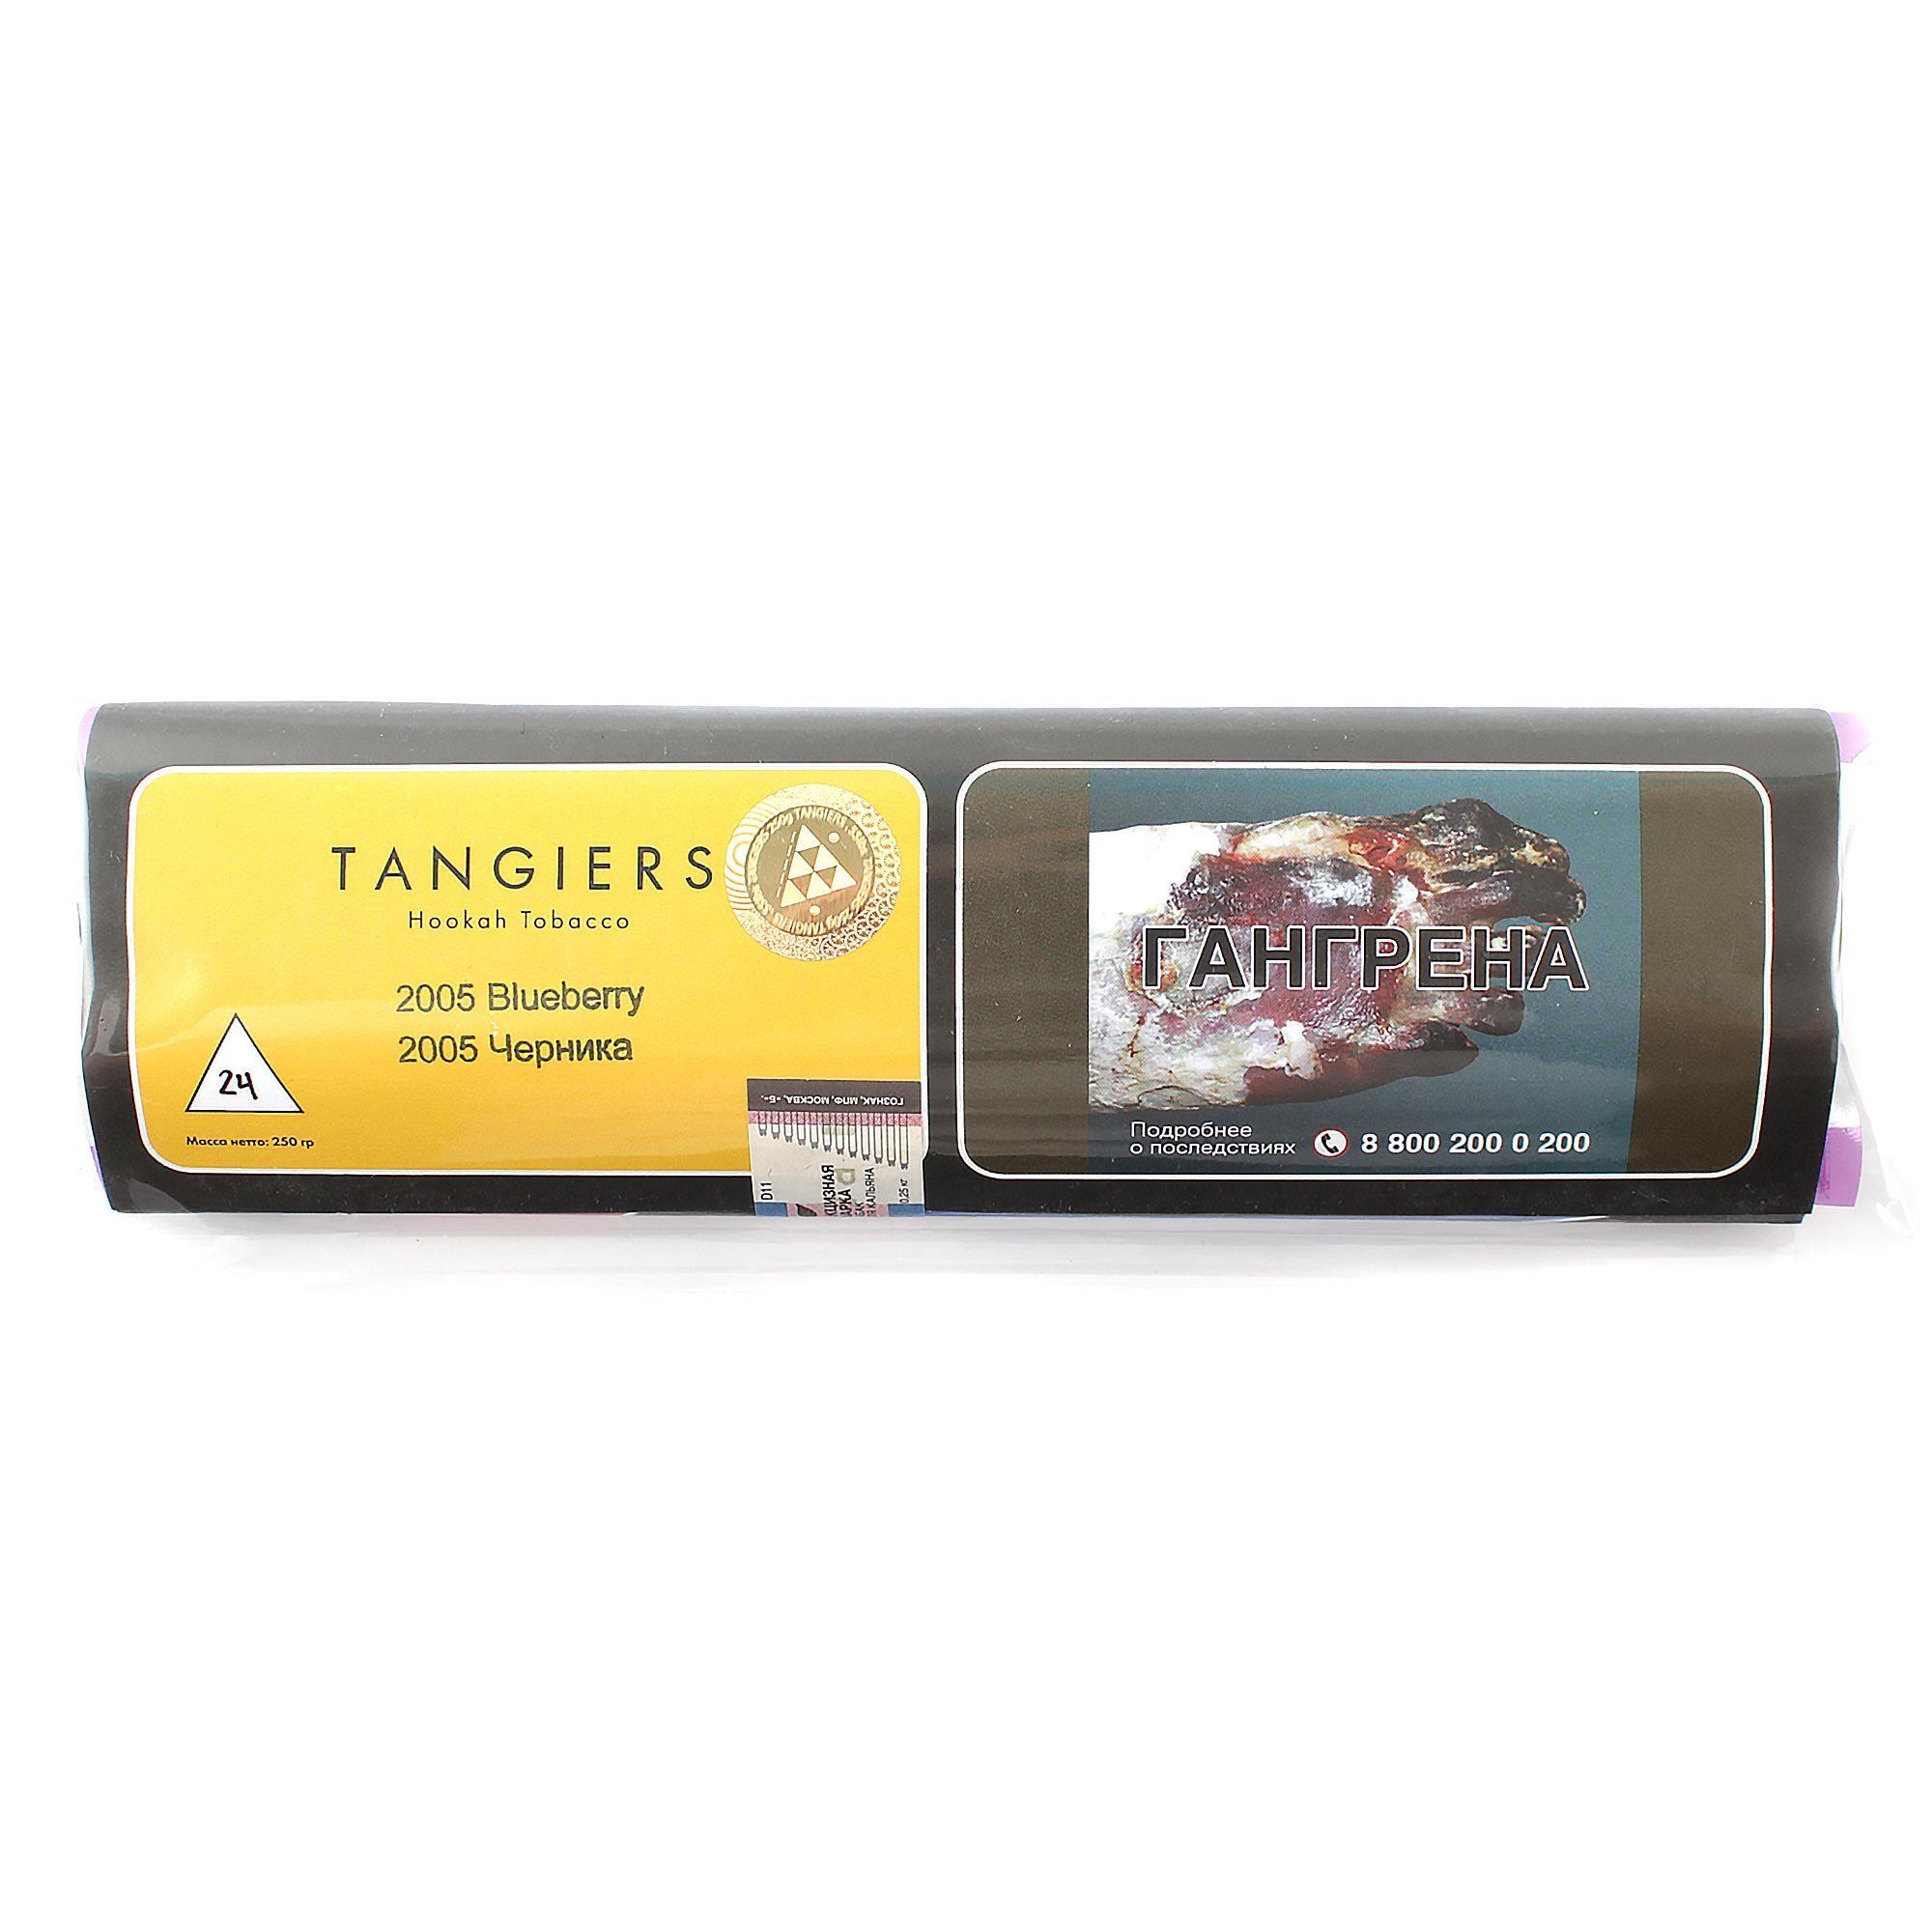 Табак для кальяна Tangiers Noir (желтый) 24 2005 Blueberry 250 гр